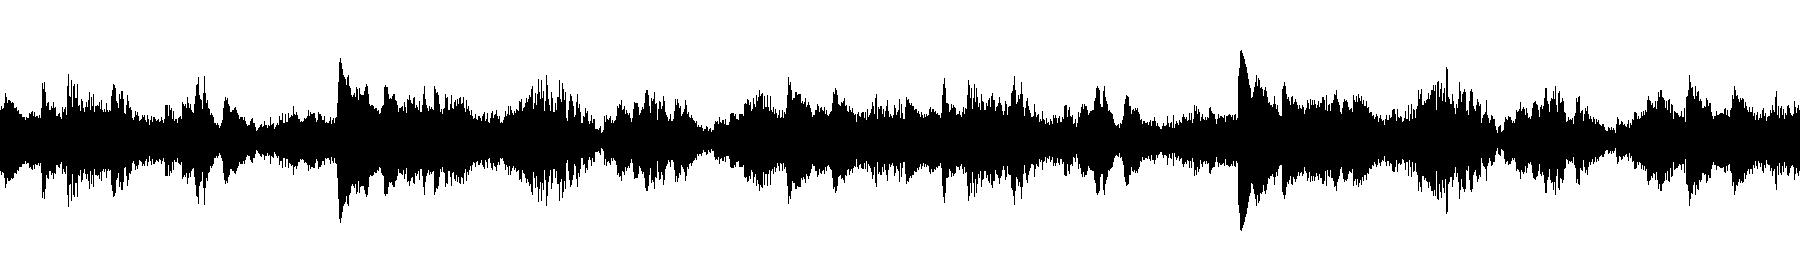 102 eb oldtgtr sp 01